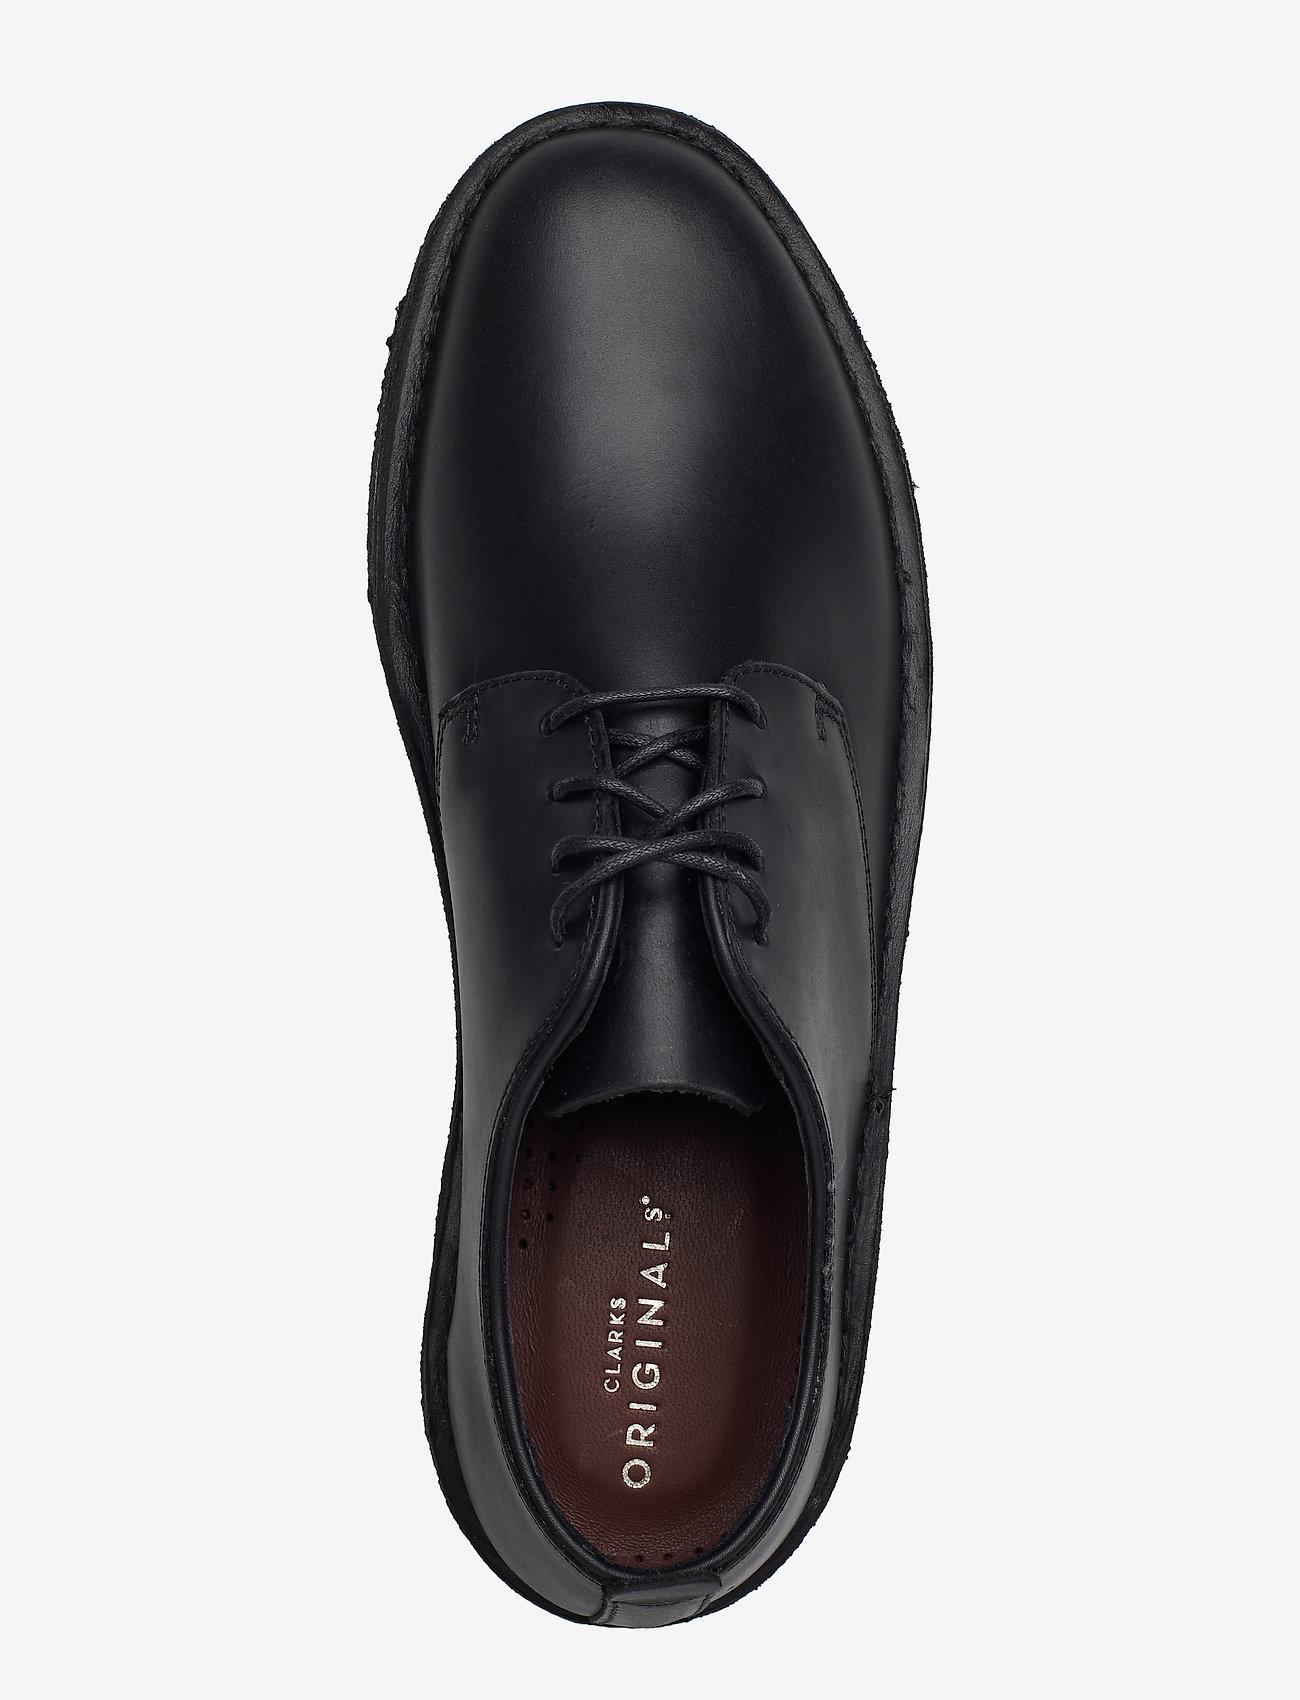 Clarks Originals - Desert London - snörskor - black leather - 3